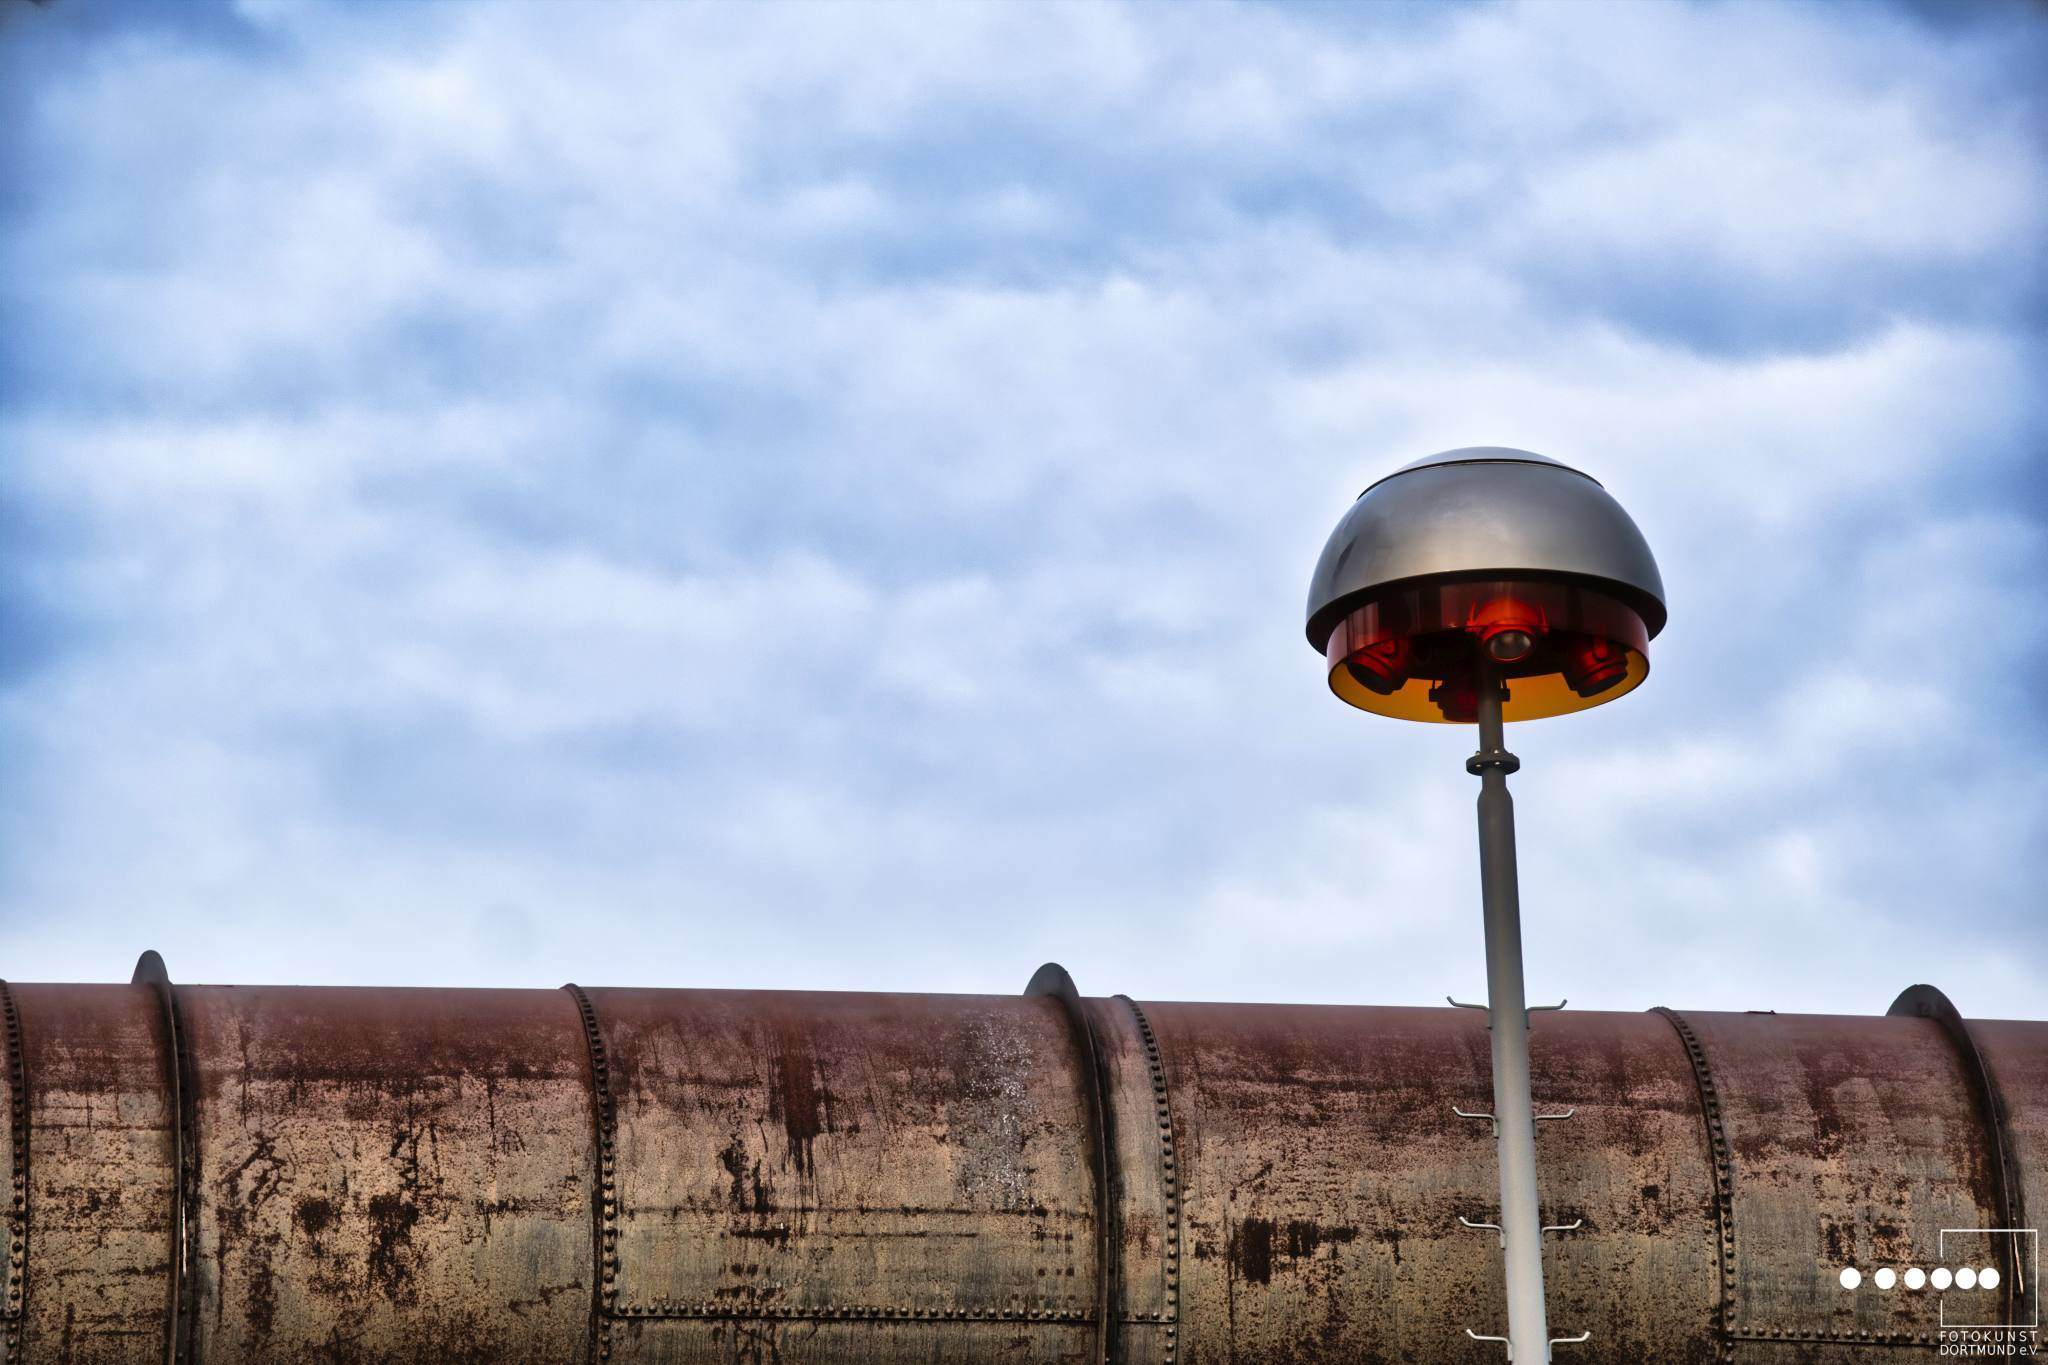 UFO-Landeplatz © Dirk Stadil